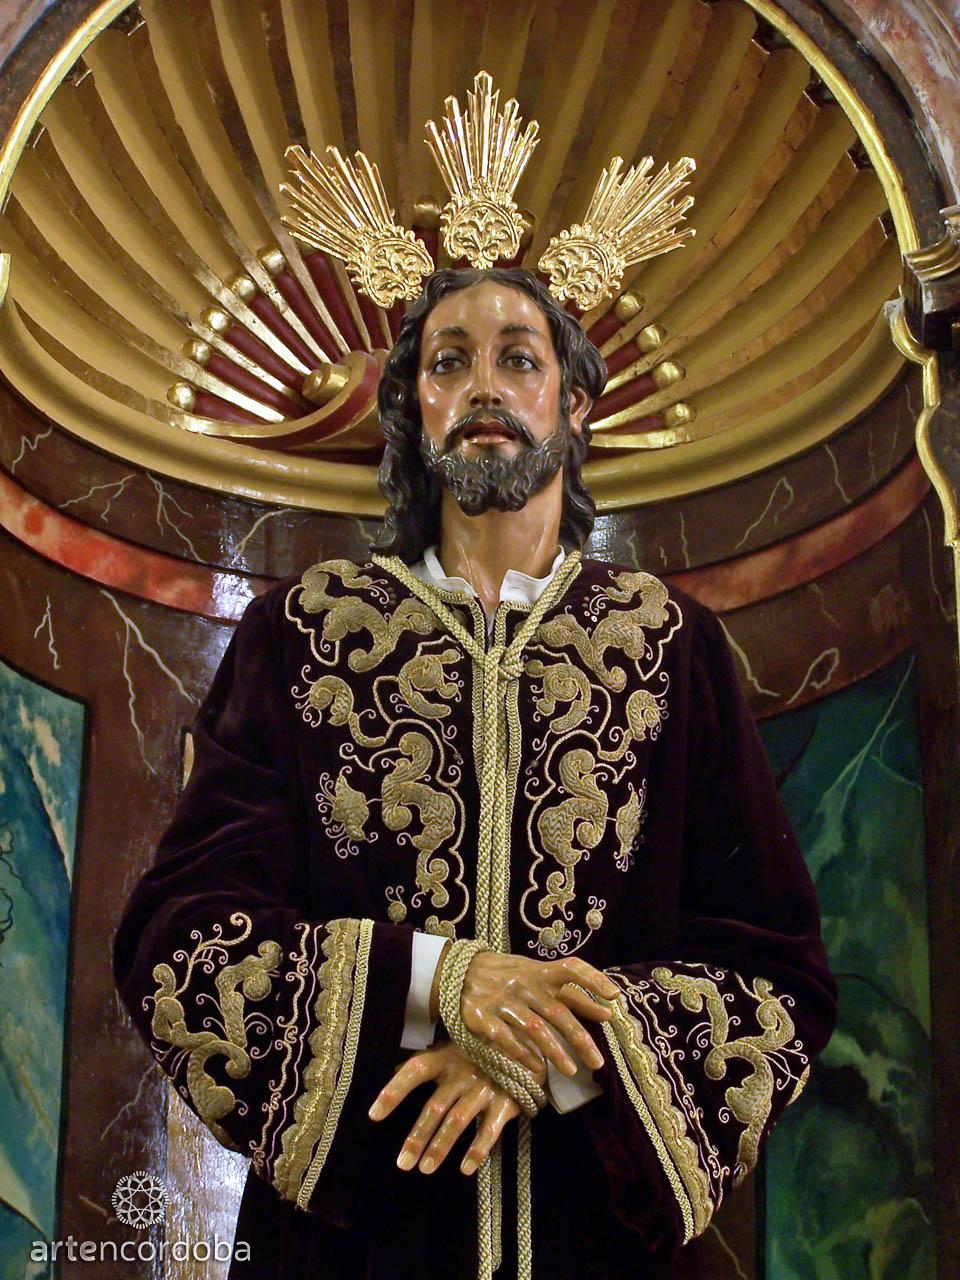 Nuestro Padre Jesús de la Sentencia - Hermandad de La Sentencia en Córdoba